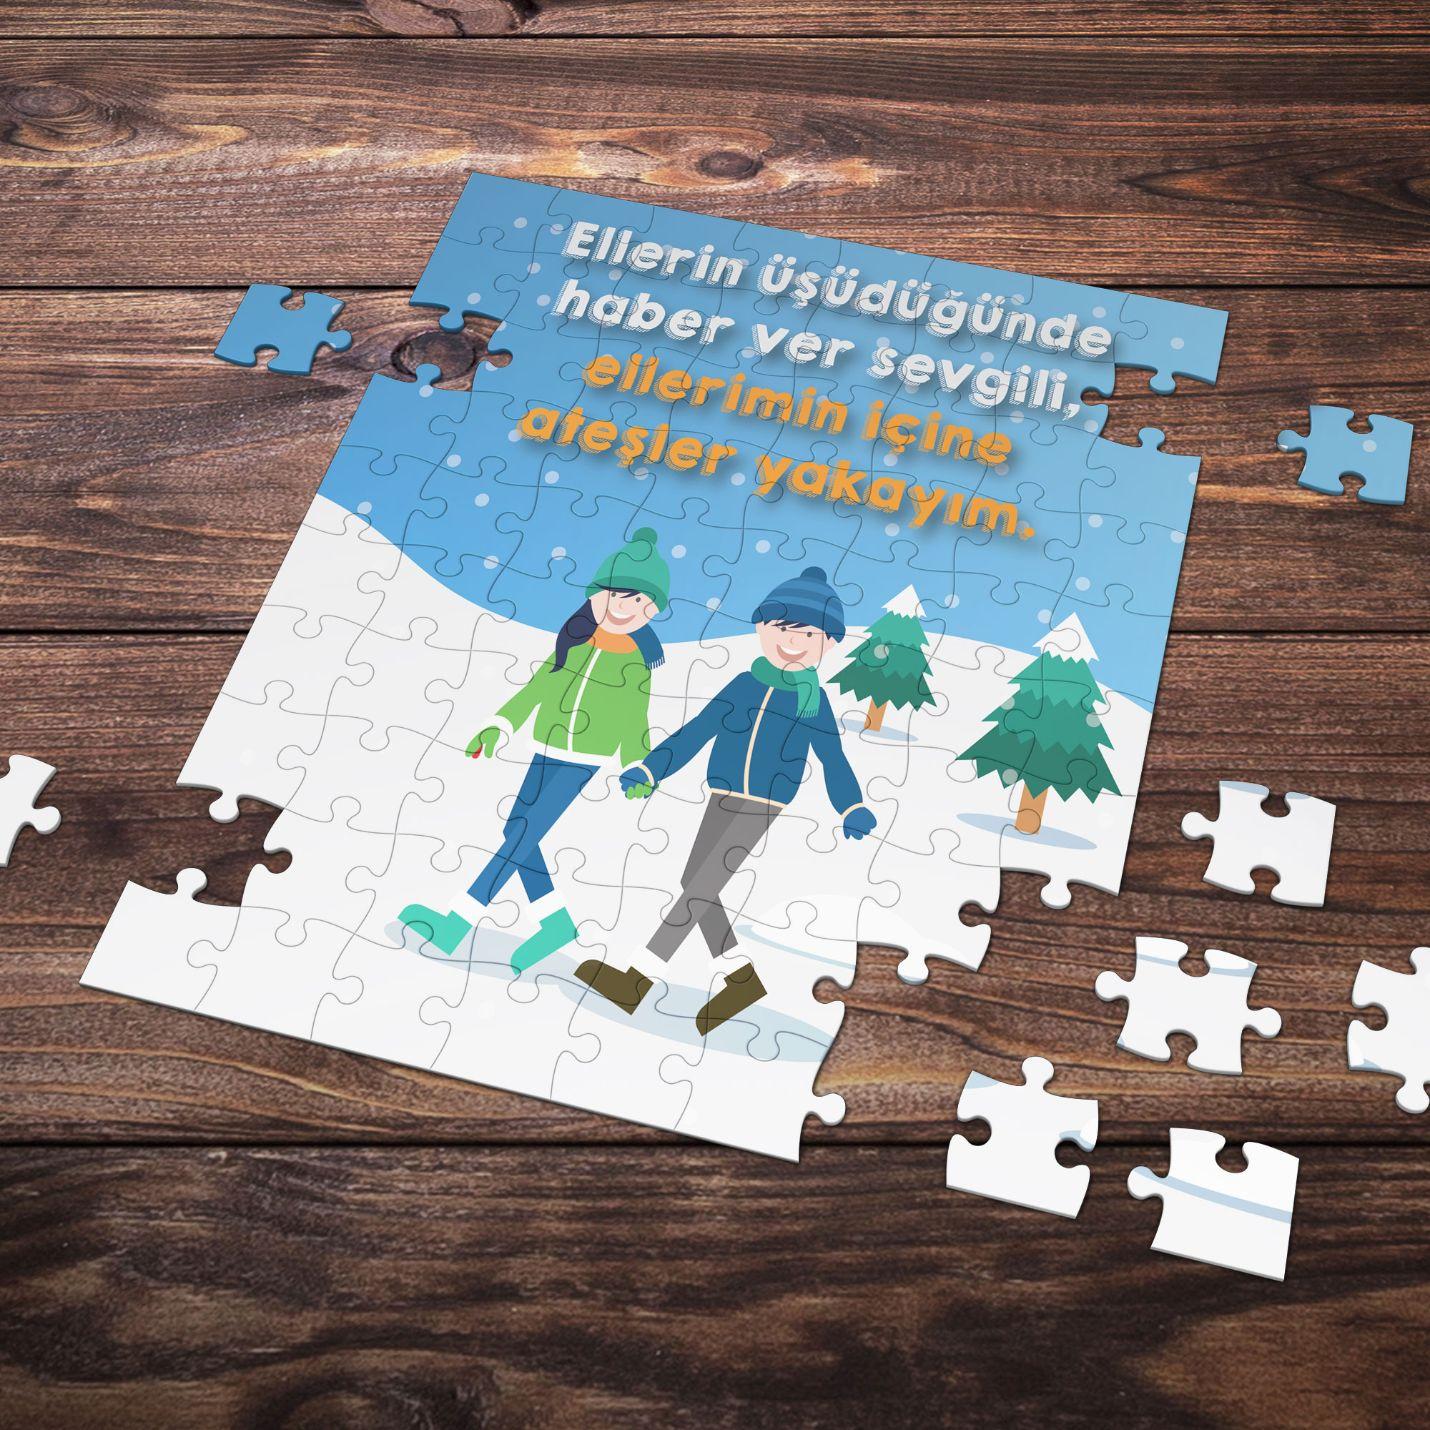 99 Parça Romantik Tasarımlı Puzzle Yapboz No3